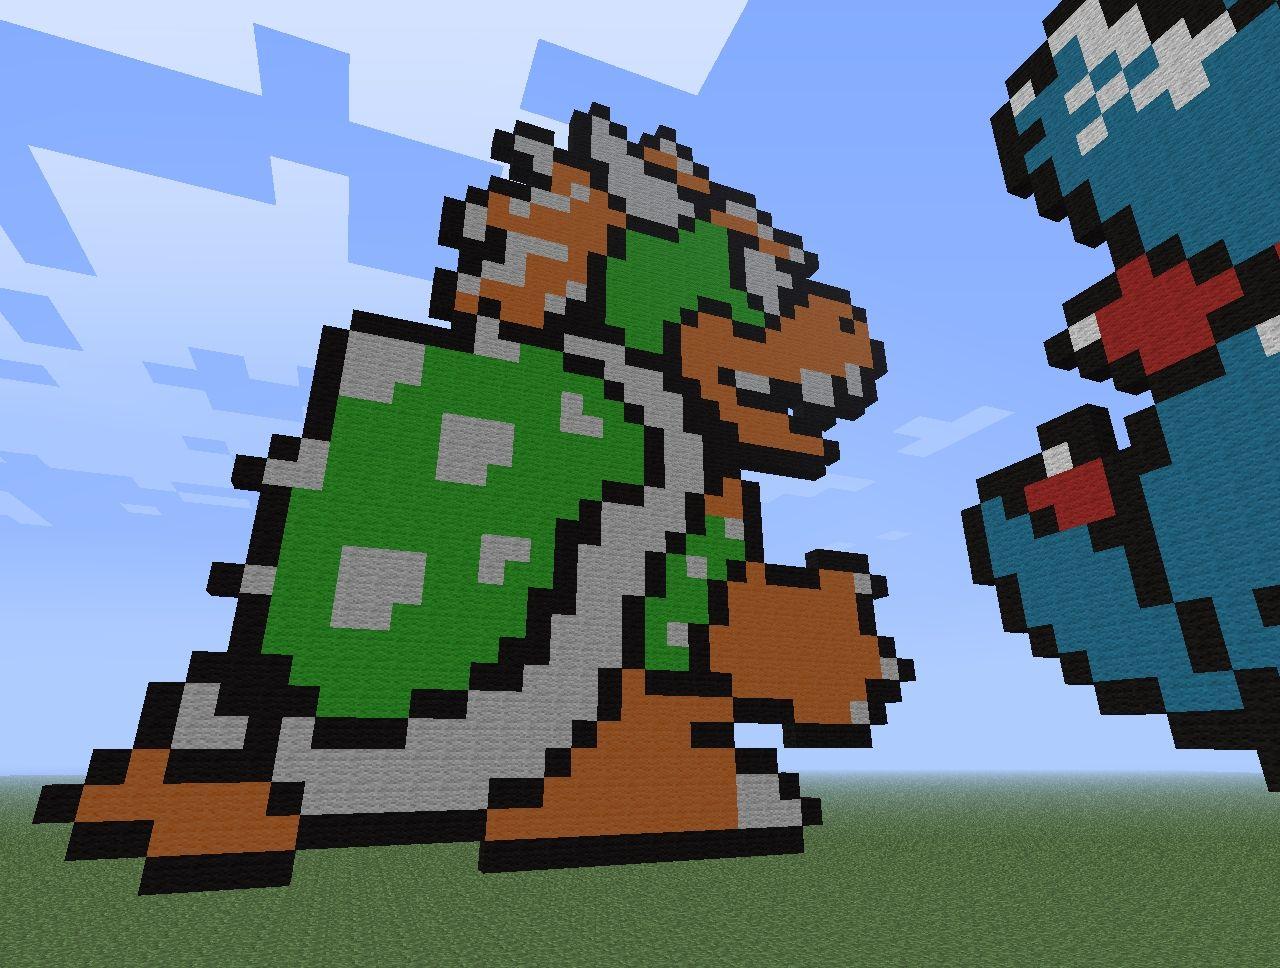 Pixel Art Minecraft Bowser